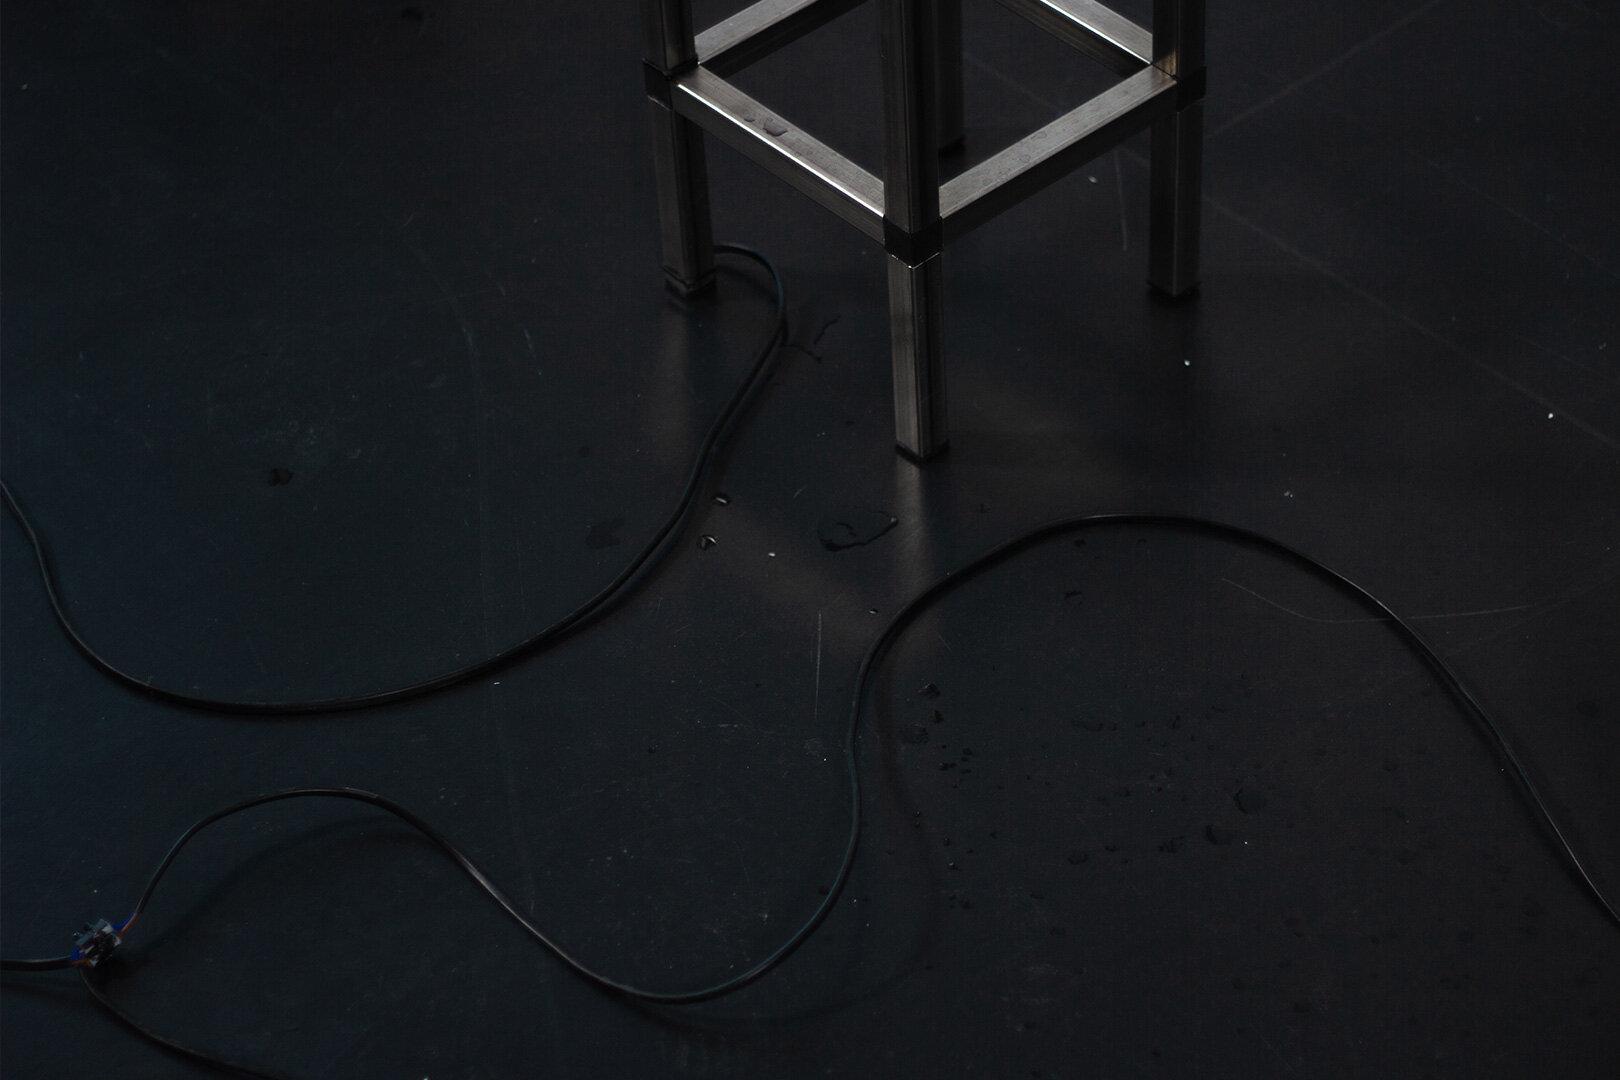 wet-floor-symbiotic-transmitter.jpg